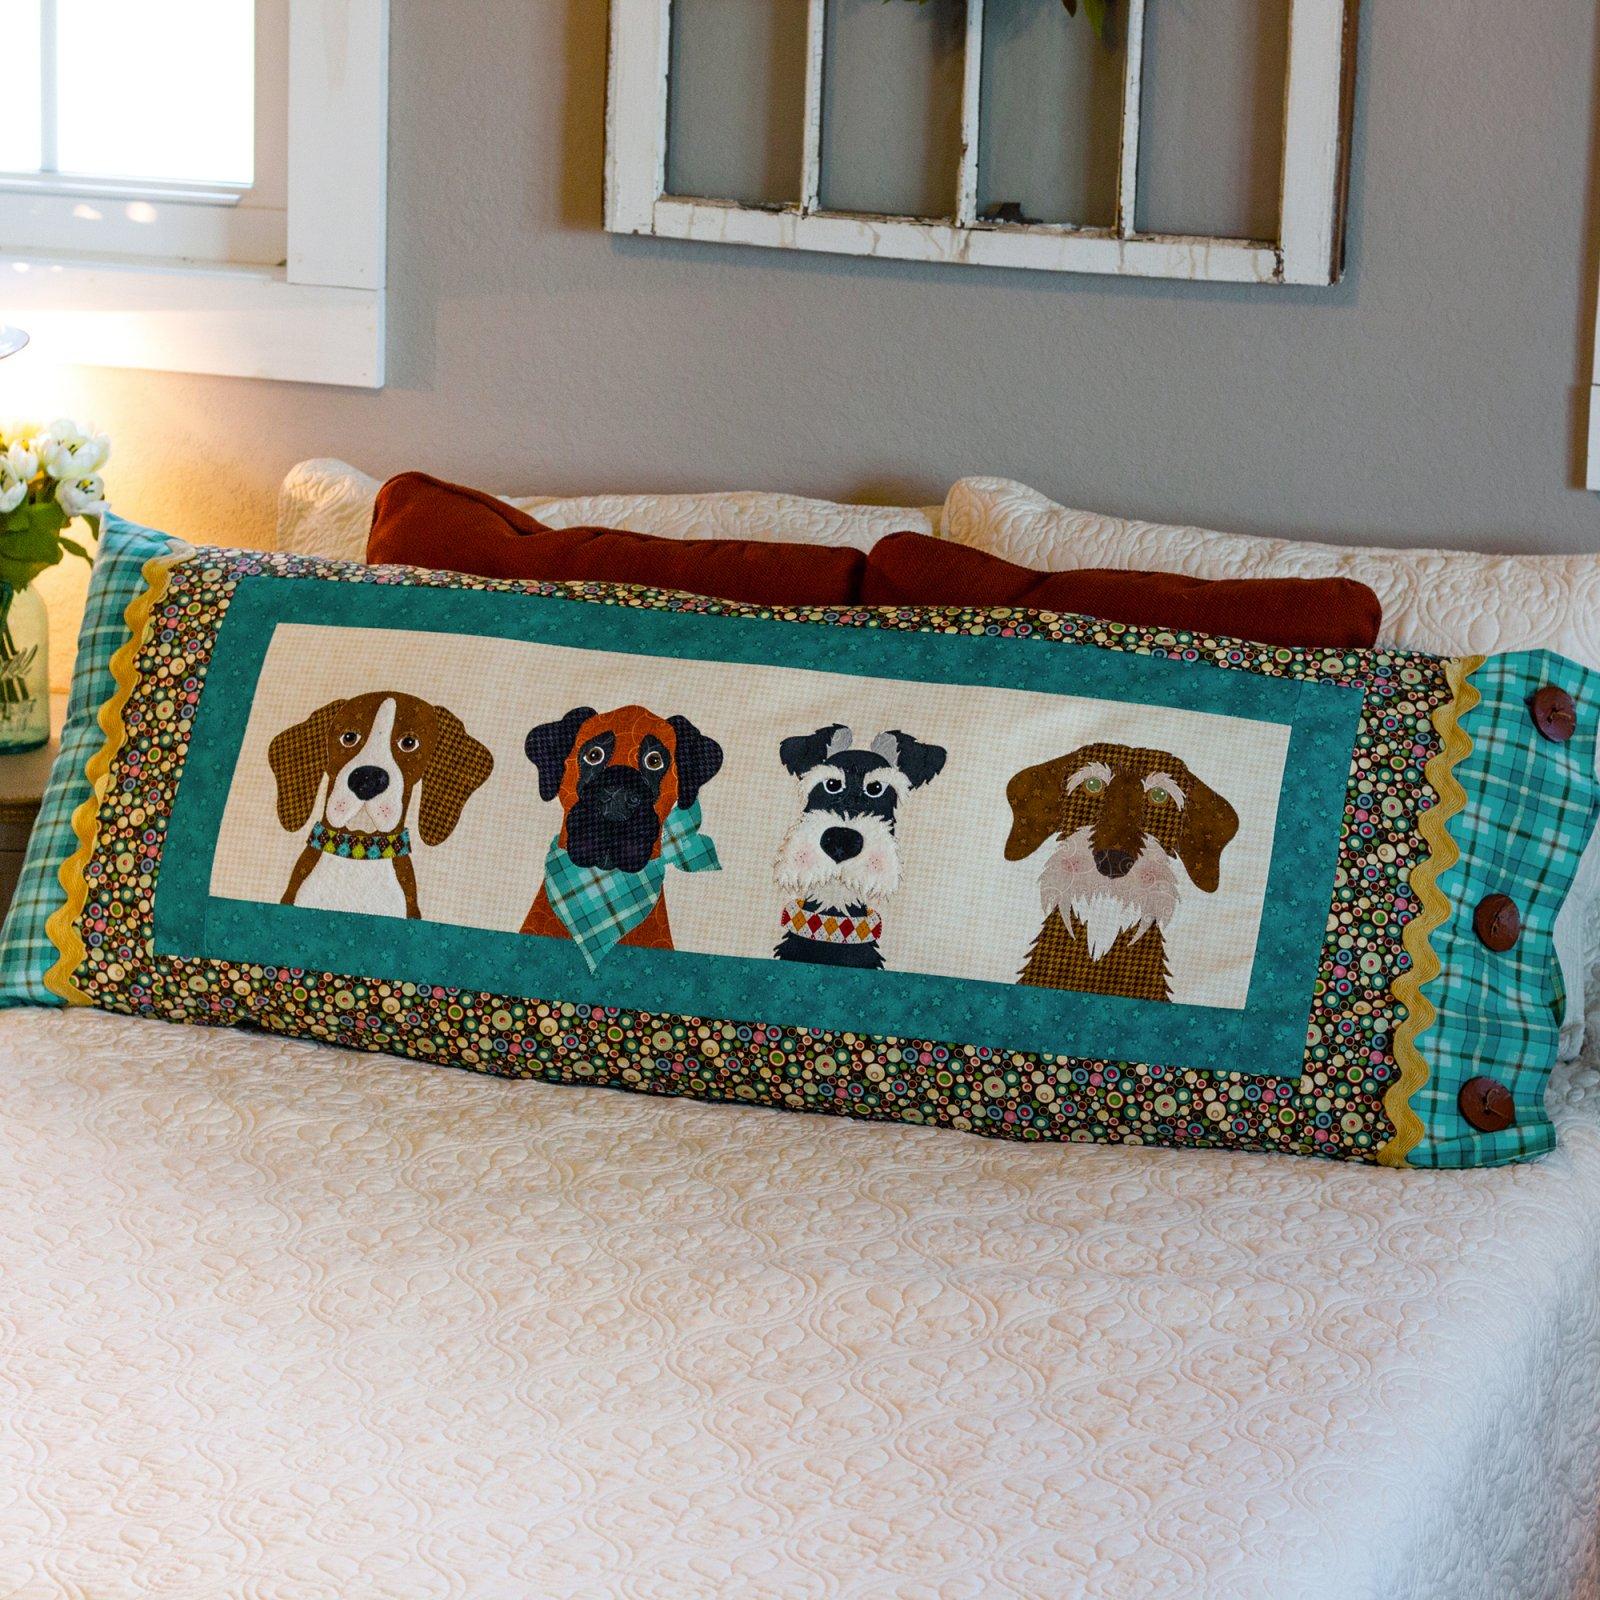 Furry Friends Applique Bench Pillow (Applique not included)